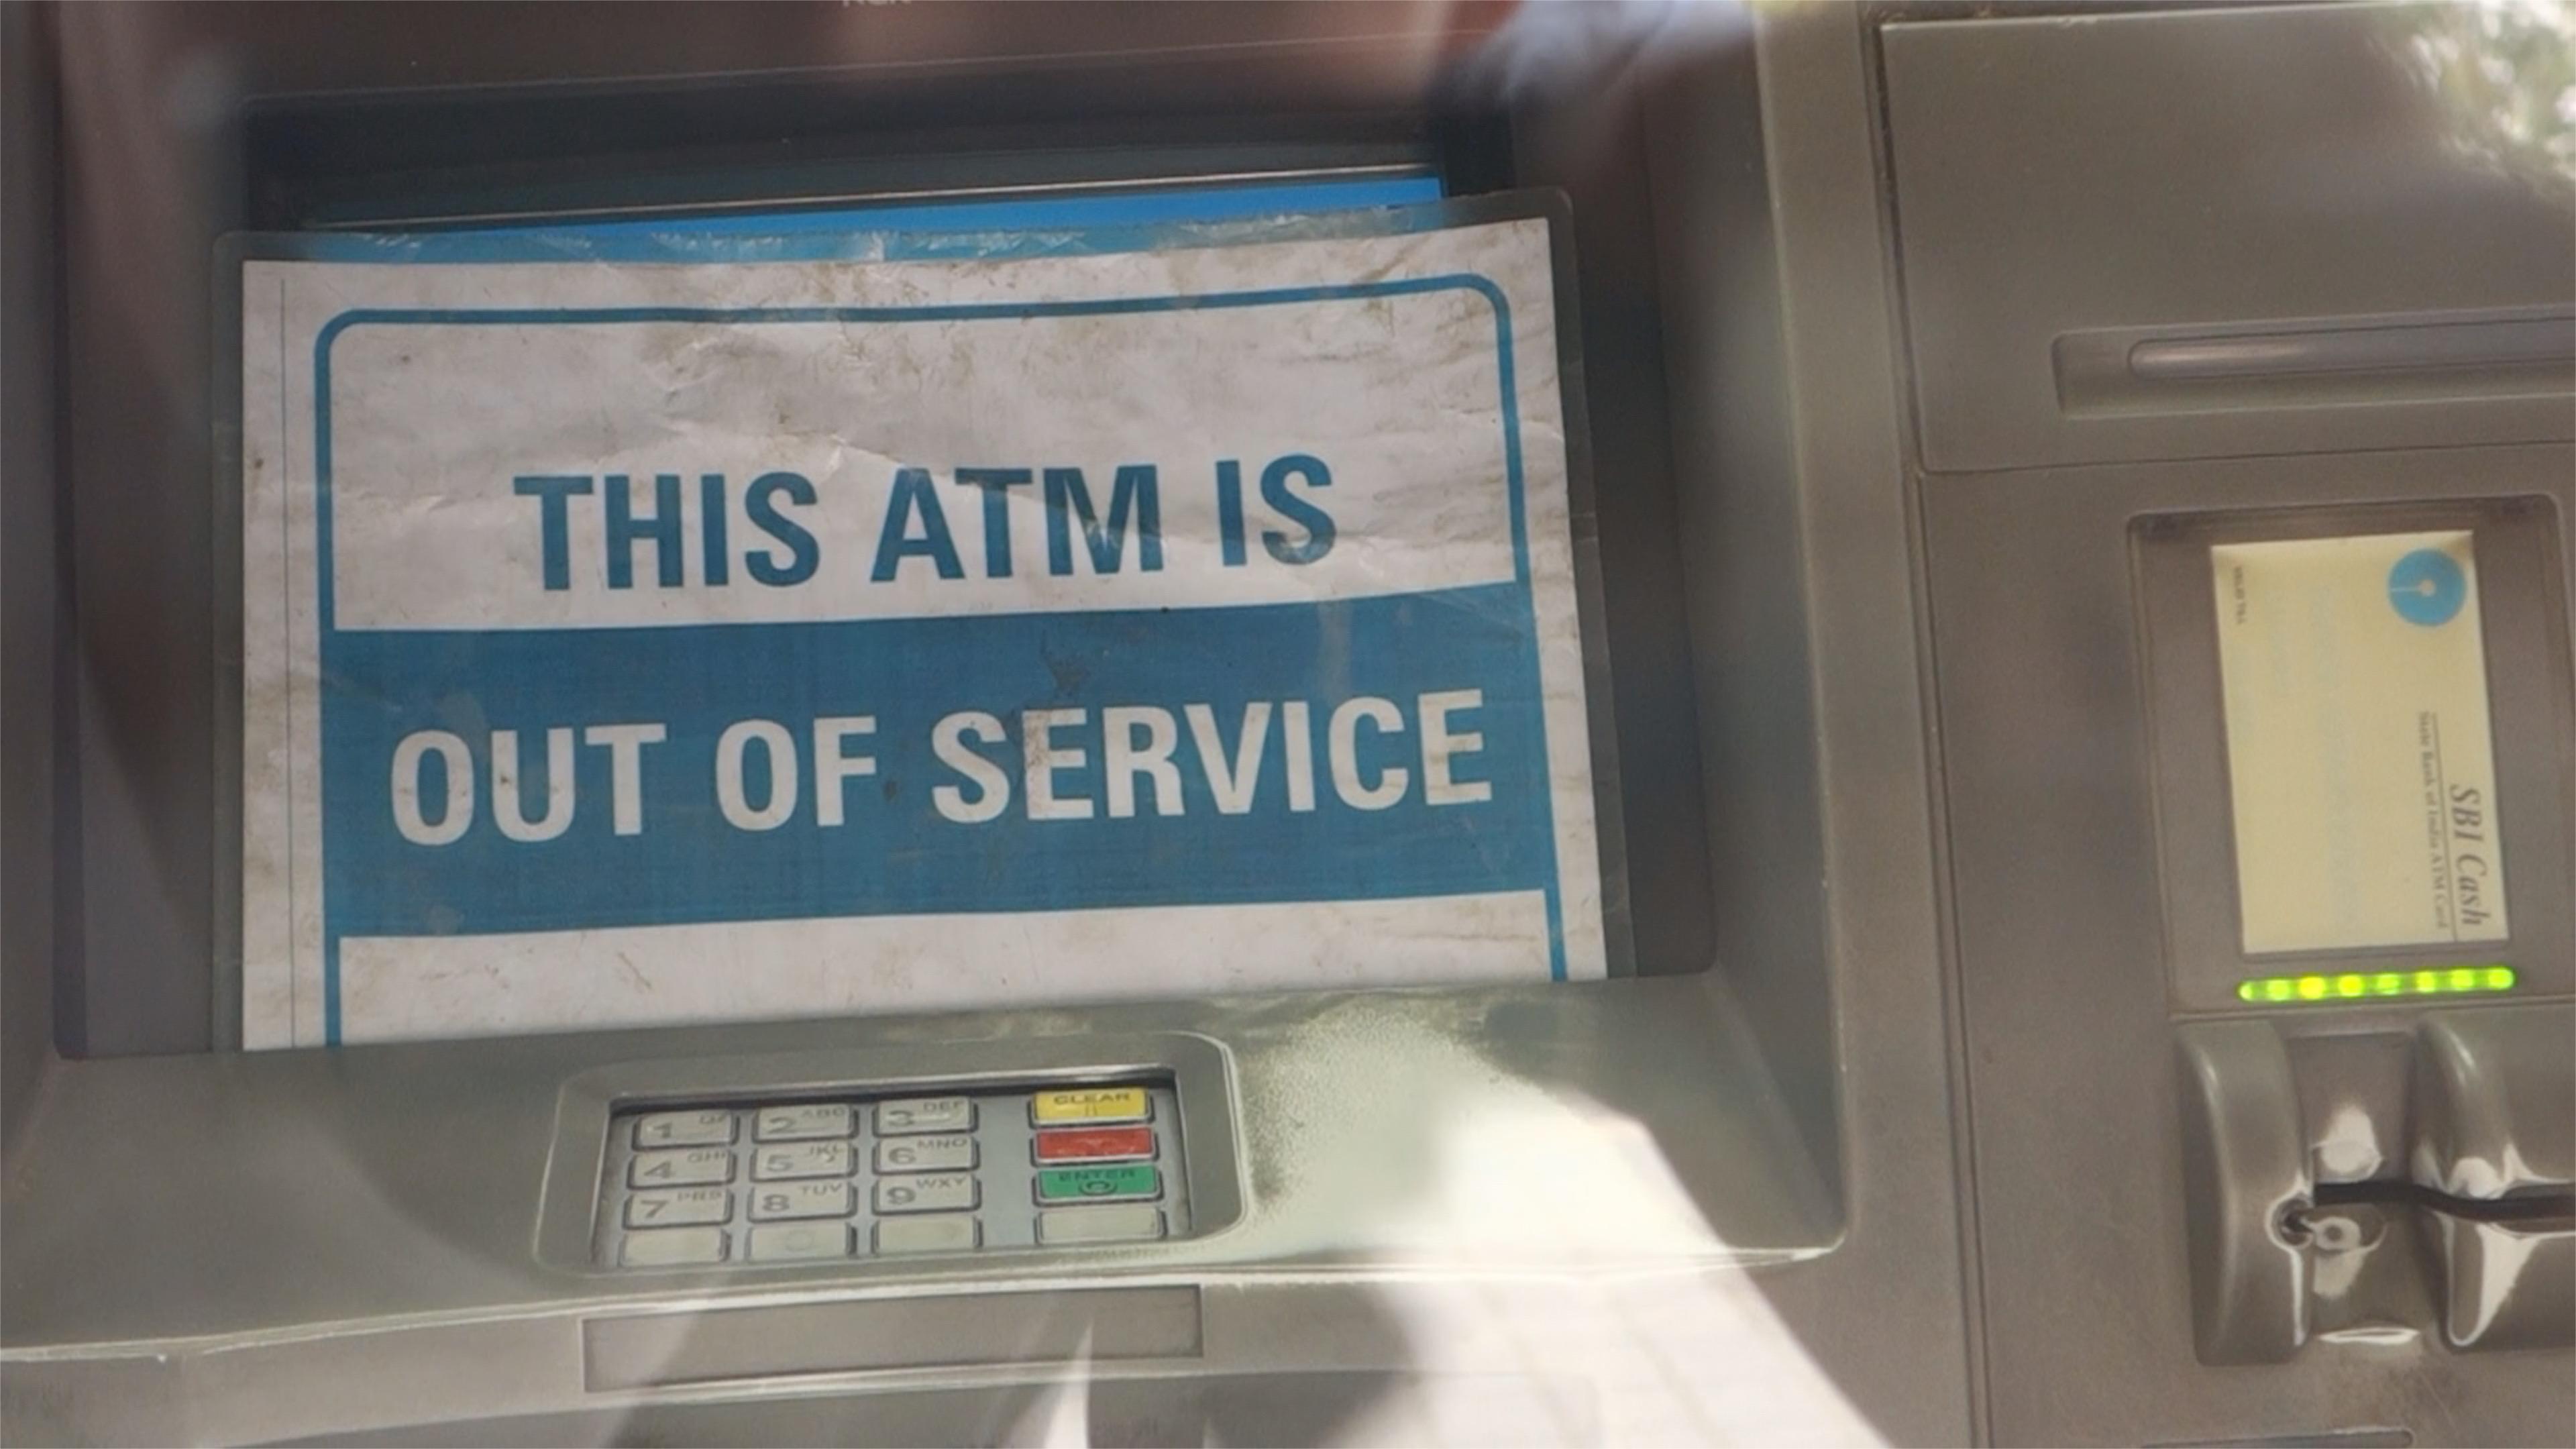 Indien Finanzkrise ATM